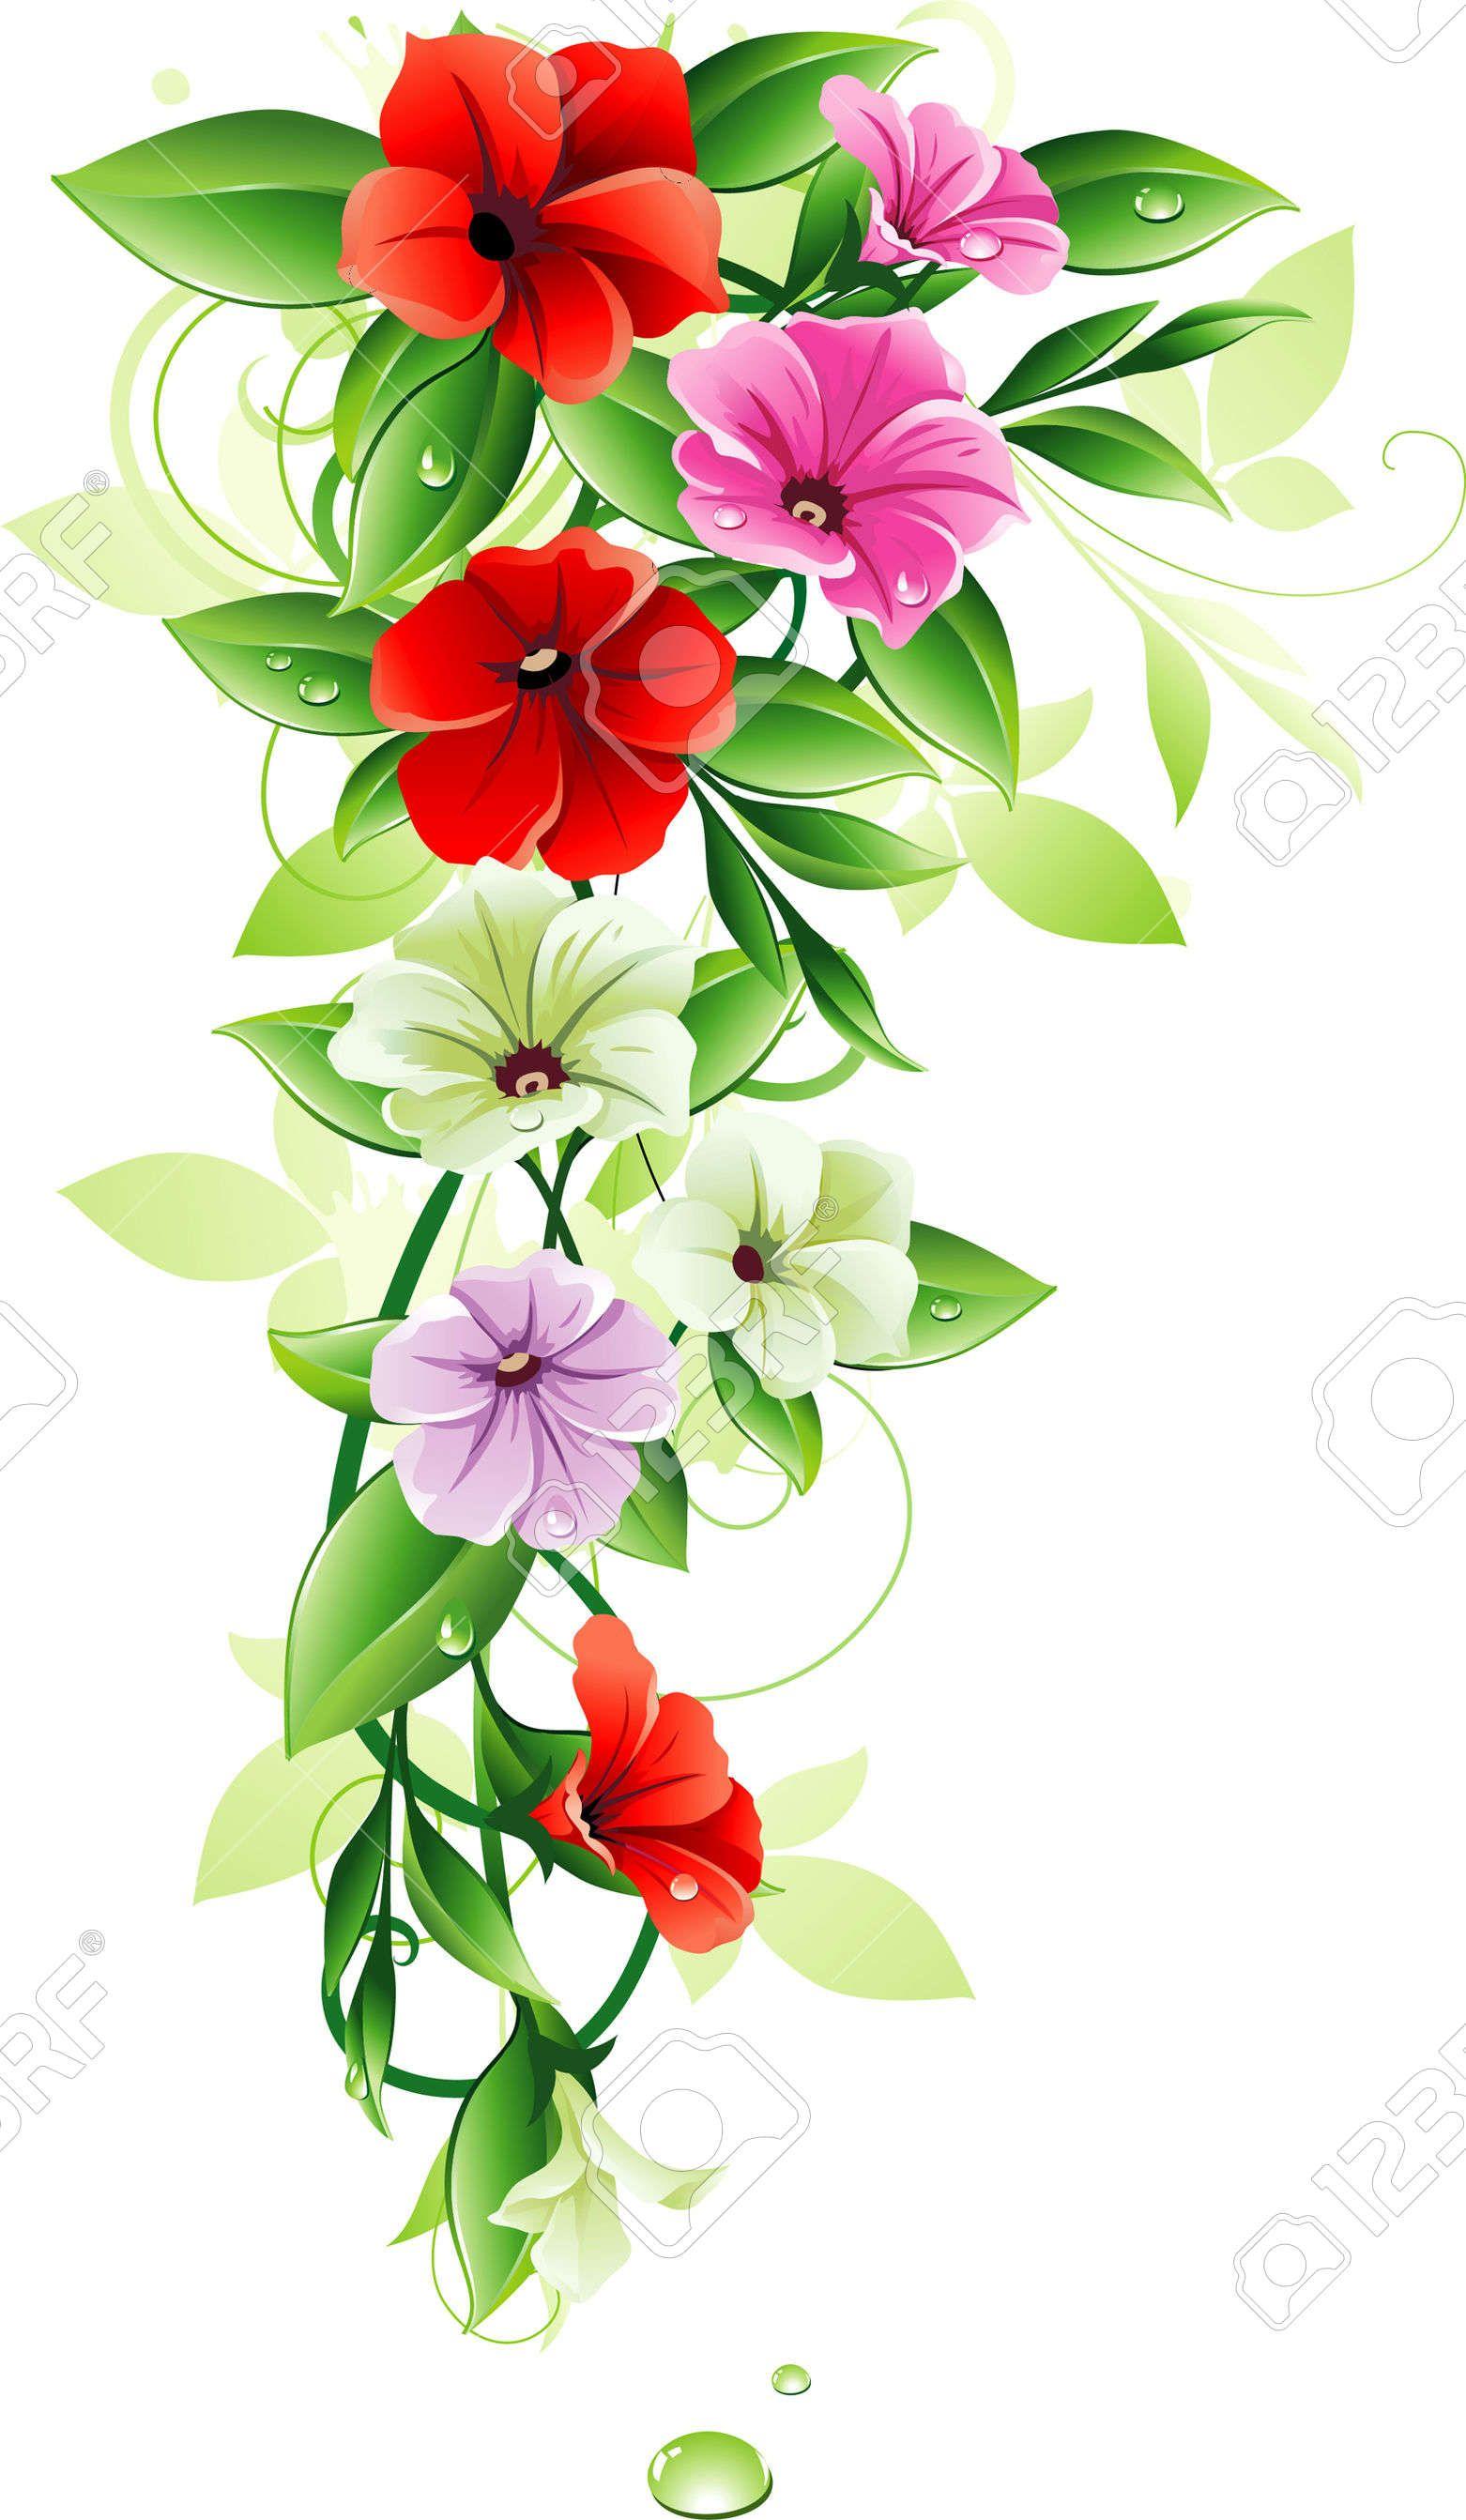 Vector floral design chalkboard art pinterest floral designs floral design izmirmasajfo